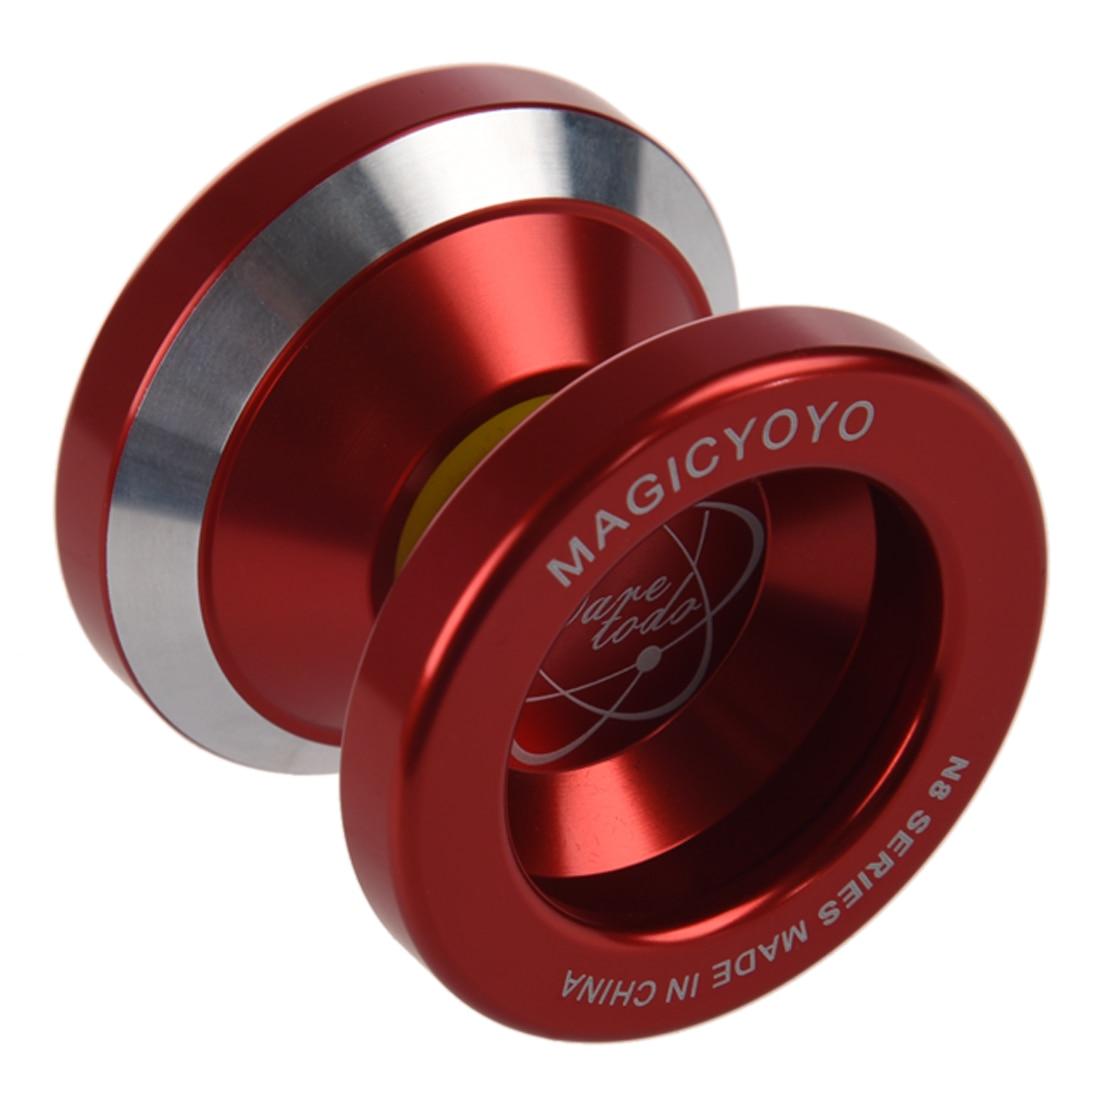 Magic Yo-Yo N8 Super professionnel YoYo + ficelle + sac gratuit + gant gratuit (rouge)